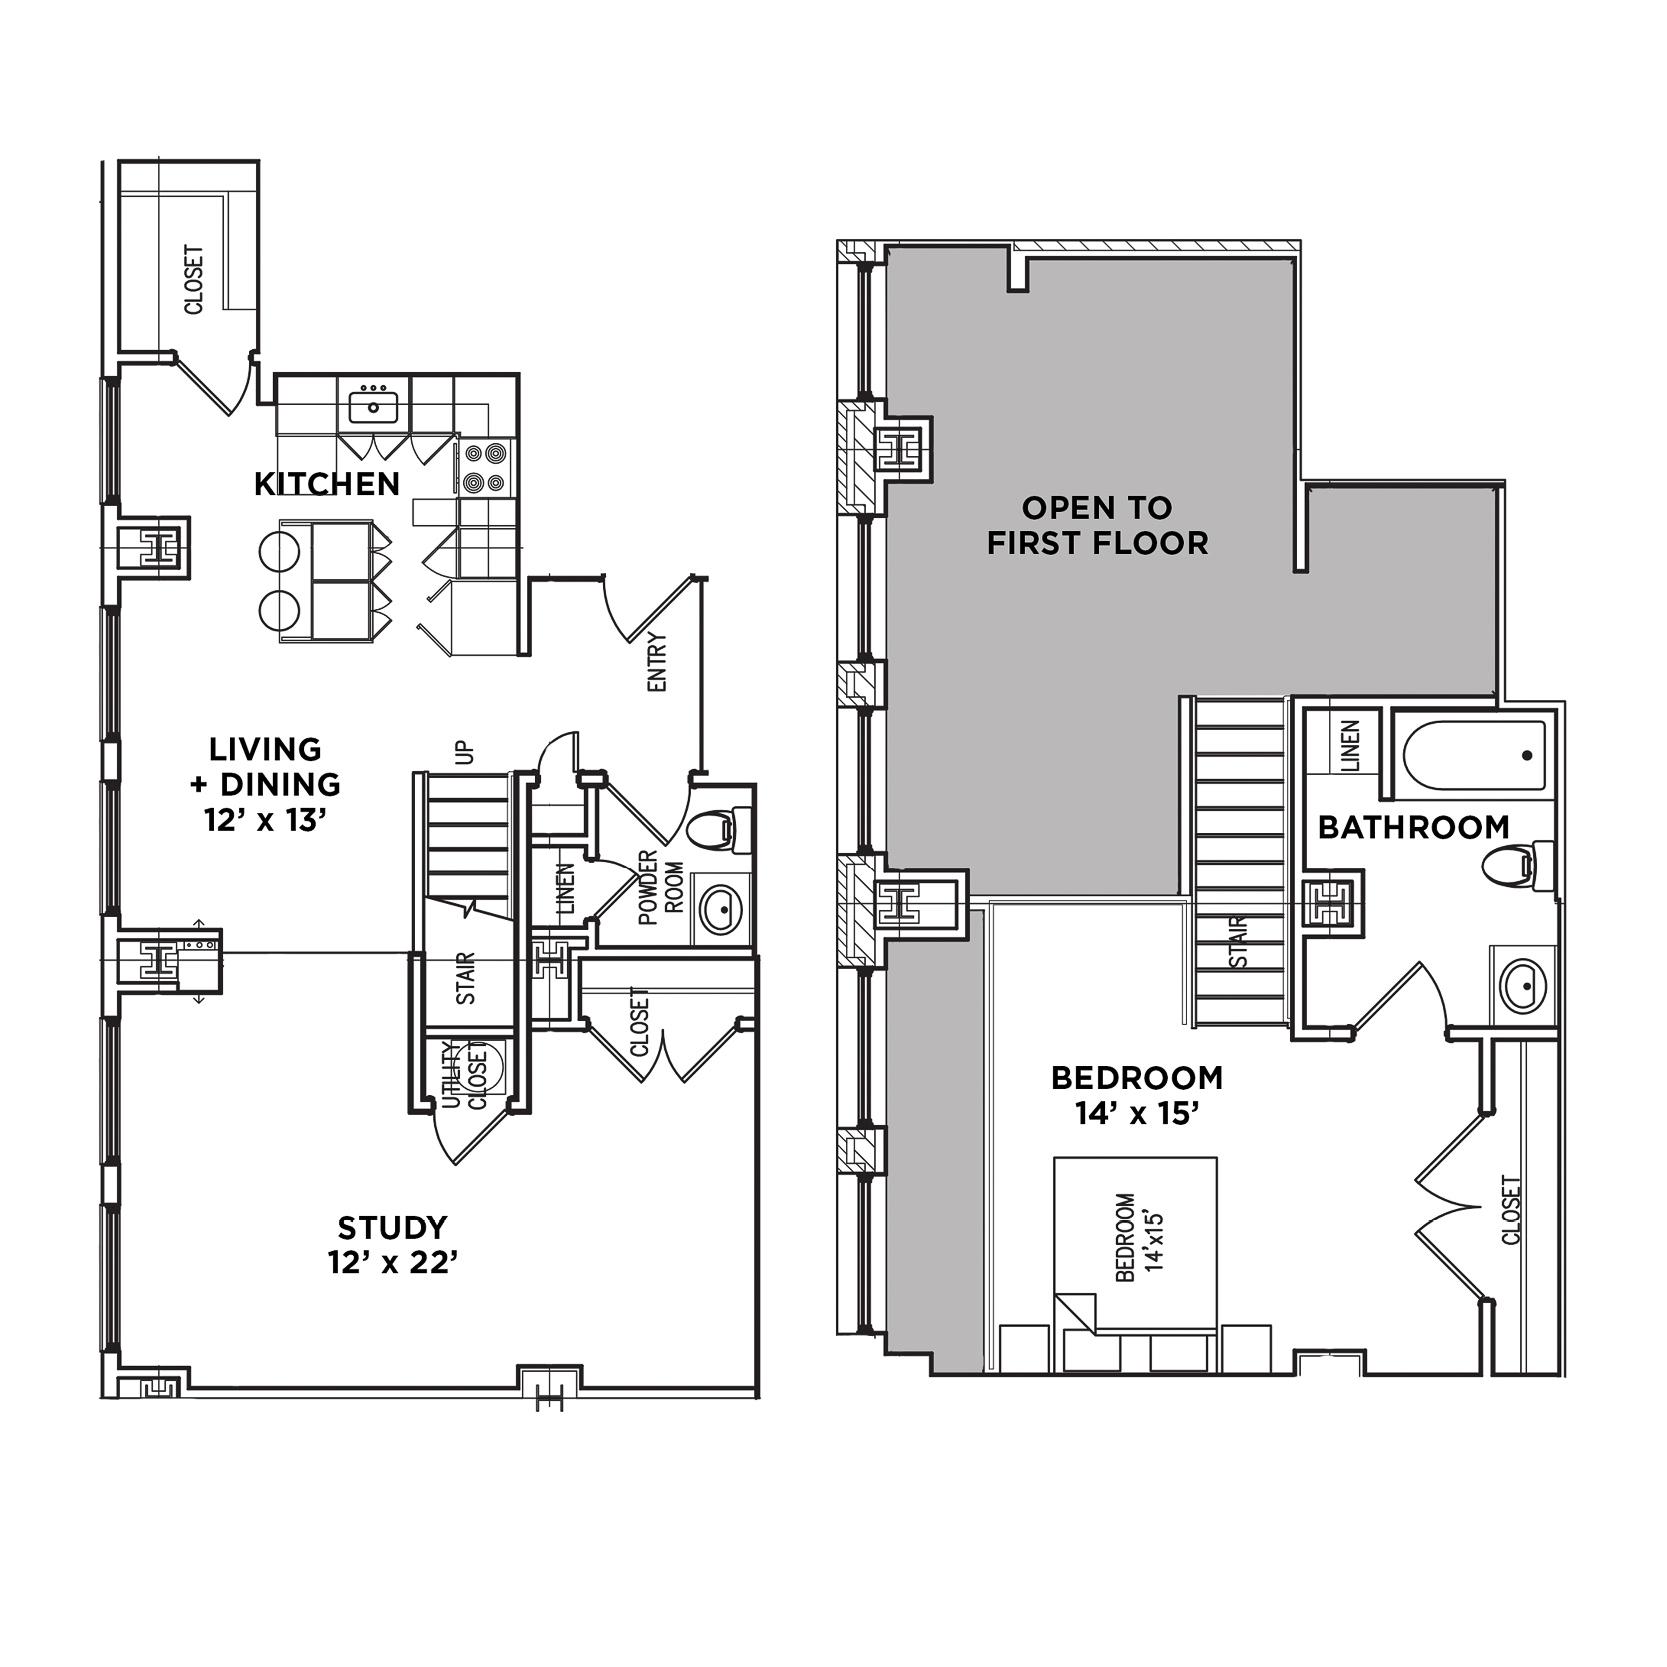 Suite F Loft (Highland Building)